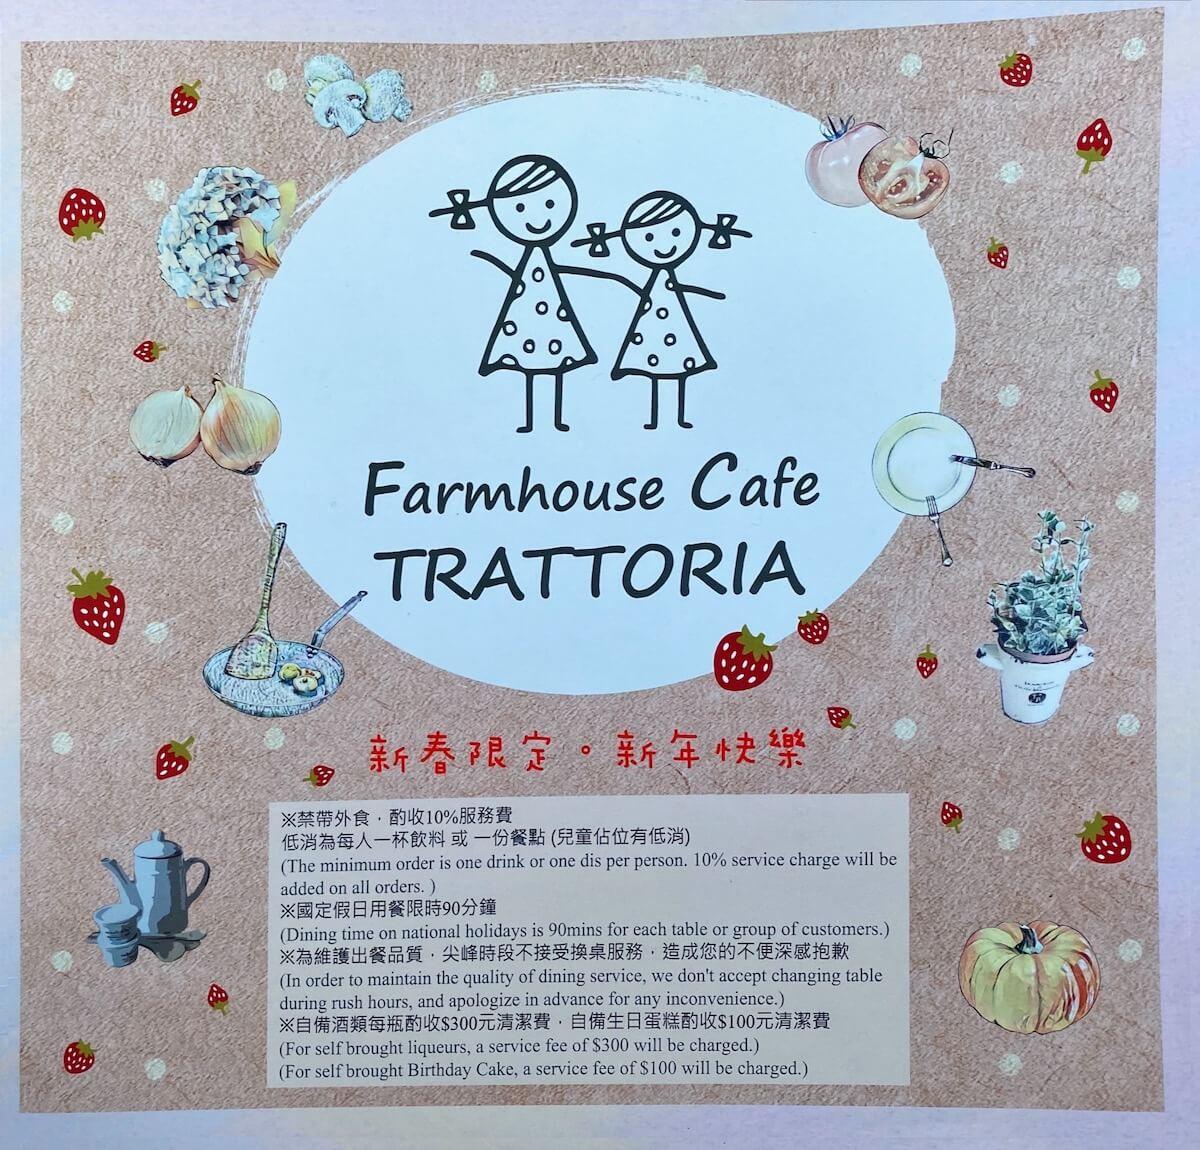 Farmhouse Cafe Trattoria Menu (front)